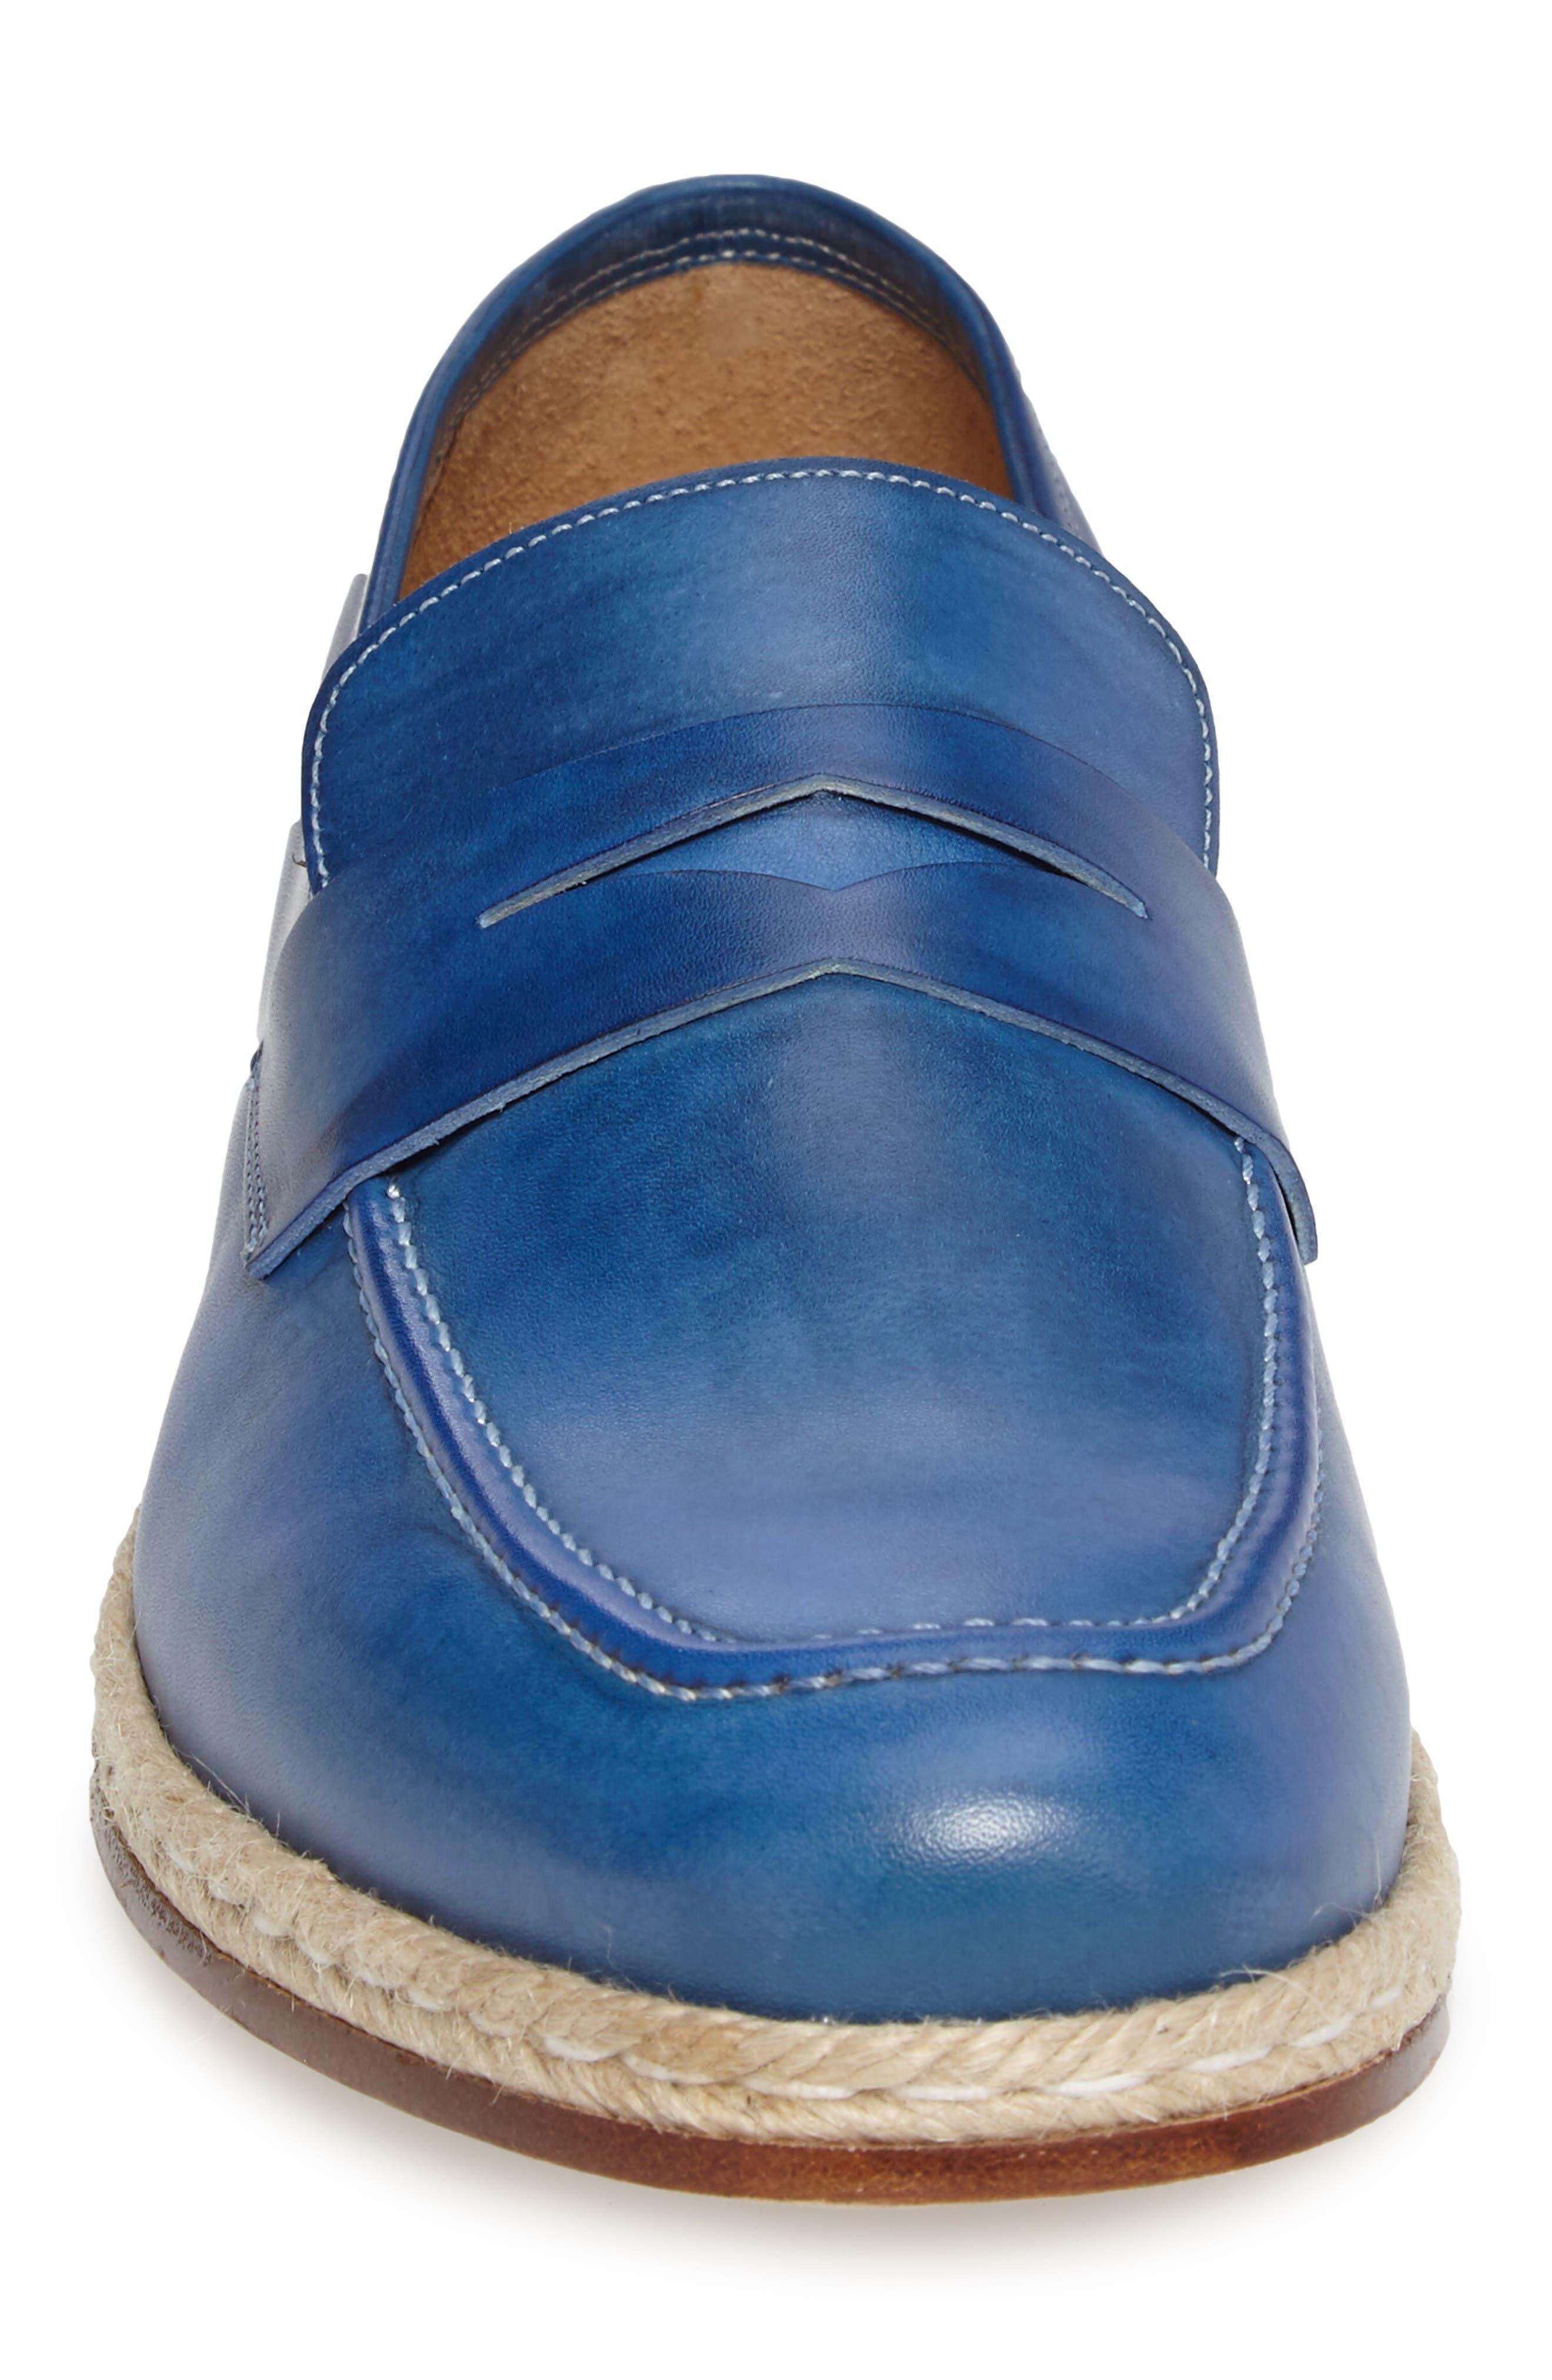 Battani Penny Loafer,                             Alternate thumbnail 4, color,                             Blue Leather